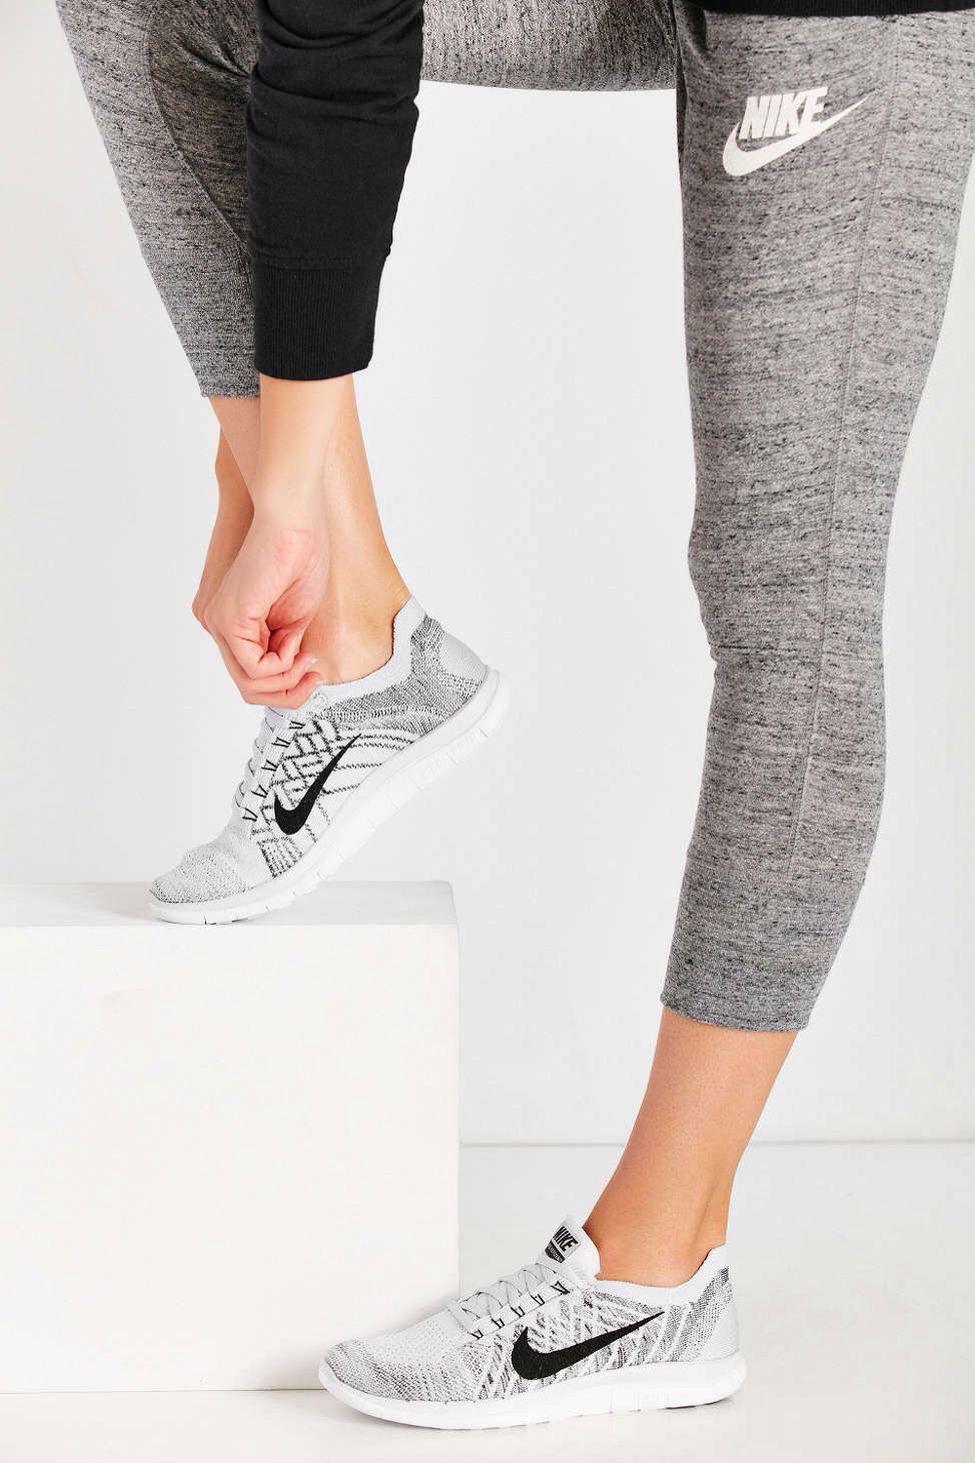 Nike Shox Outfit